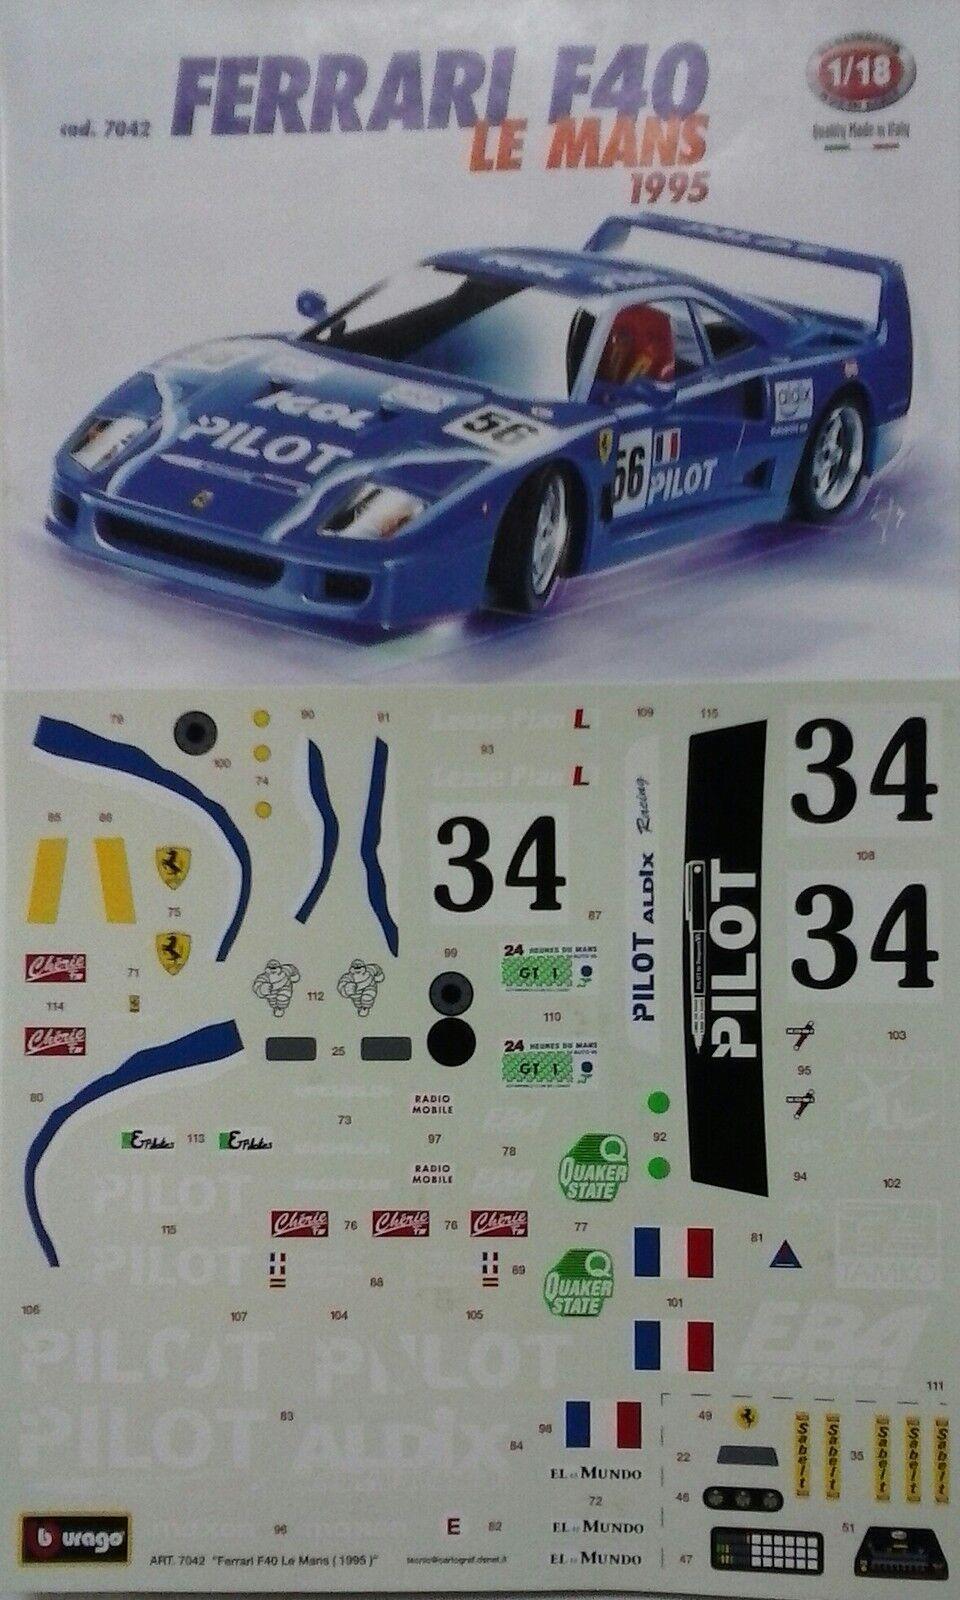 BURAGO 1:18  KIT IN METALLO AUTO FERRARI F40 LE MANS 1995 MADE IN ITALY ART 7042 | Les Produits Sont Vendus Sans Prescription Mode Et Forfaits Attractifs  | Art Exquis